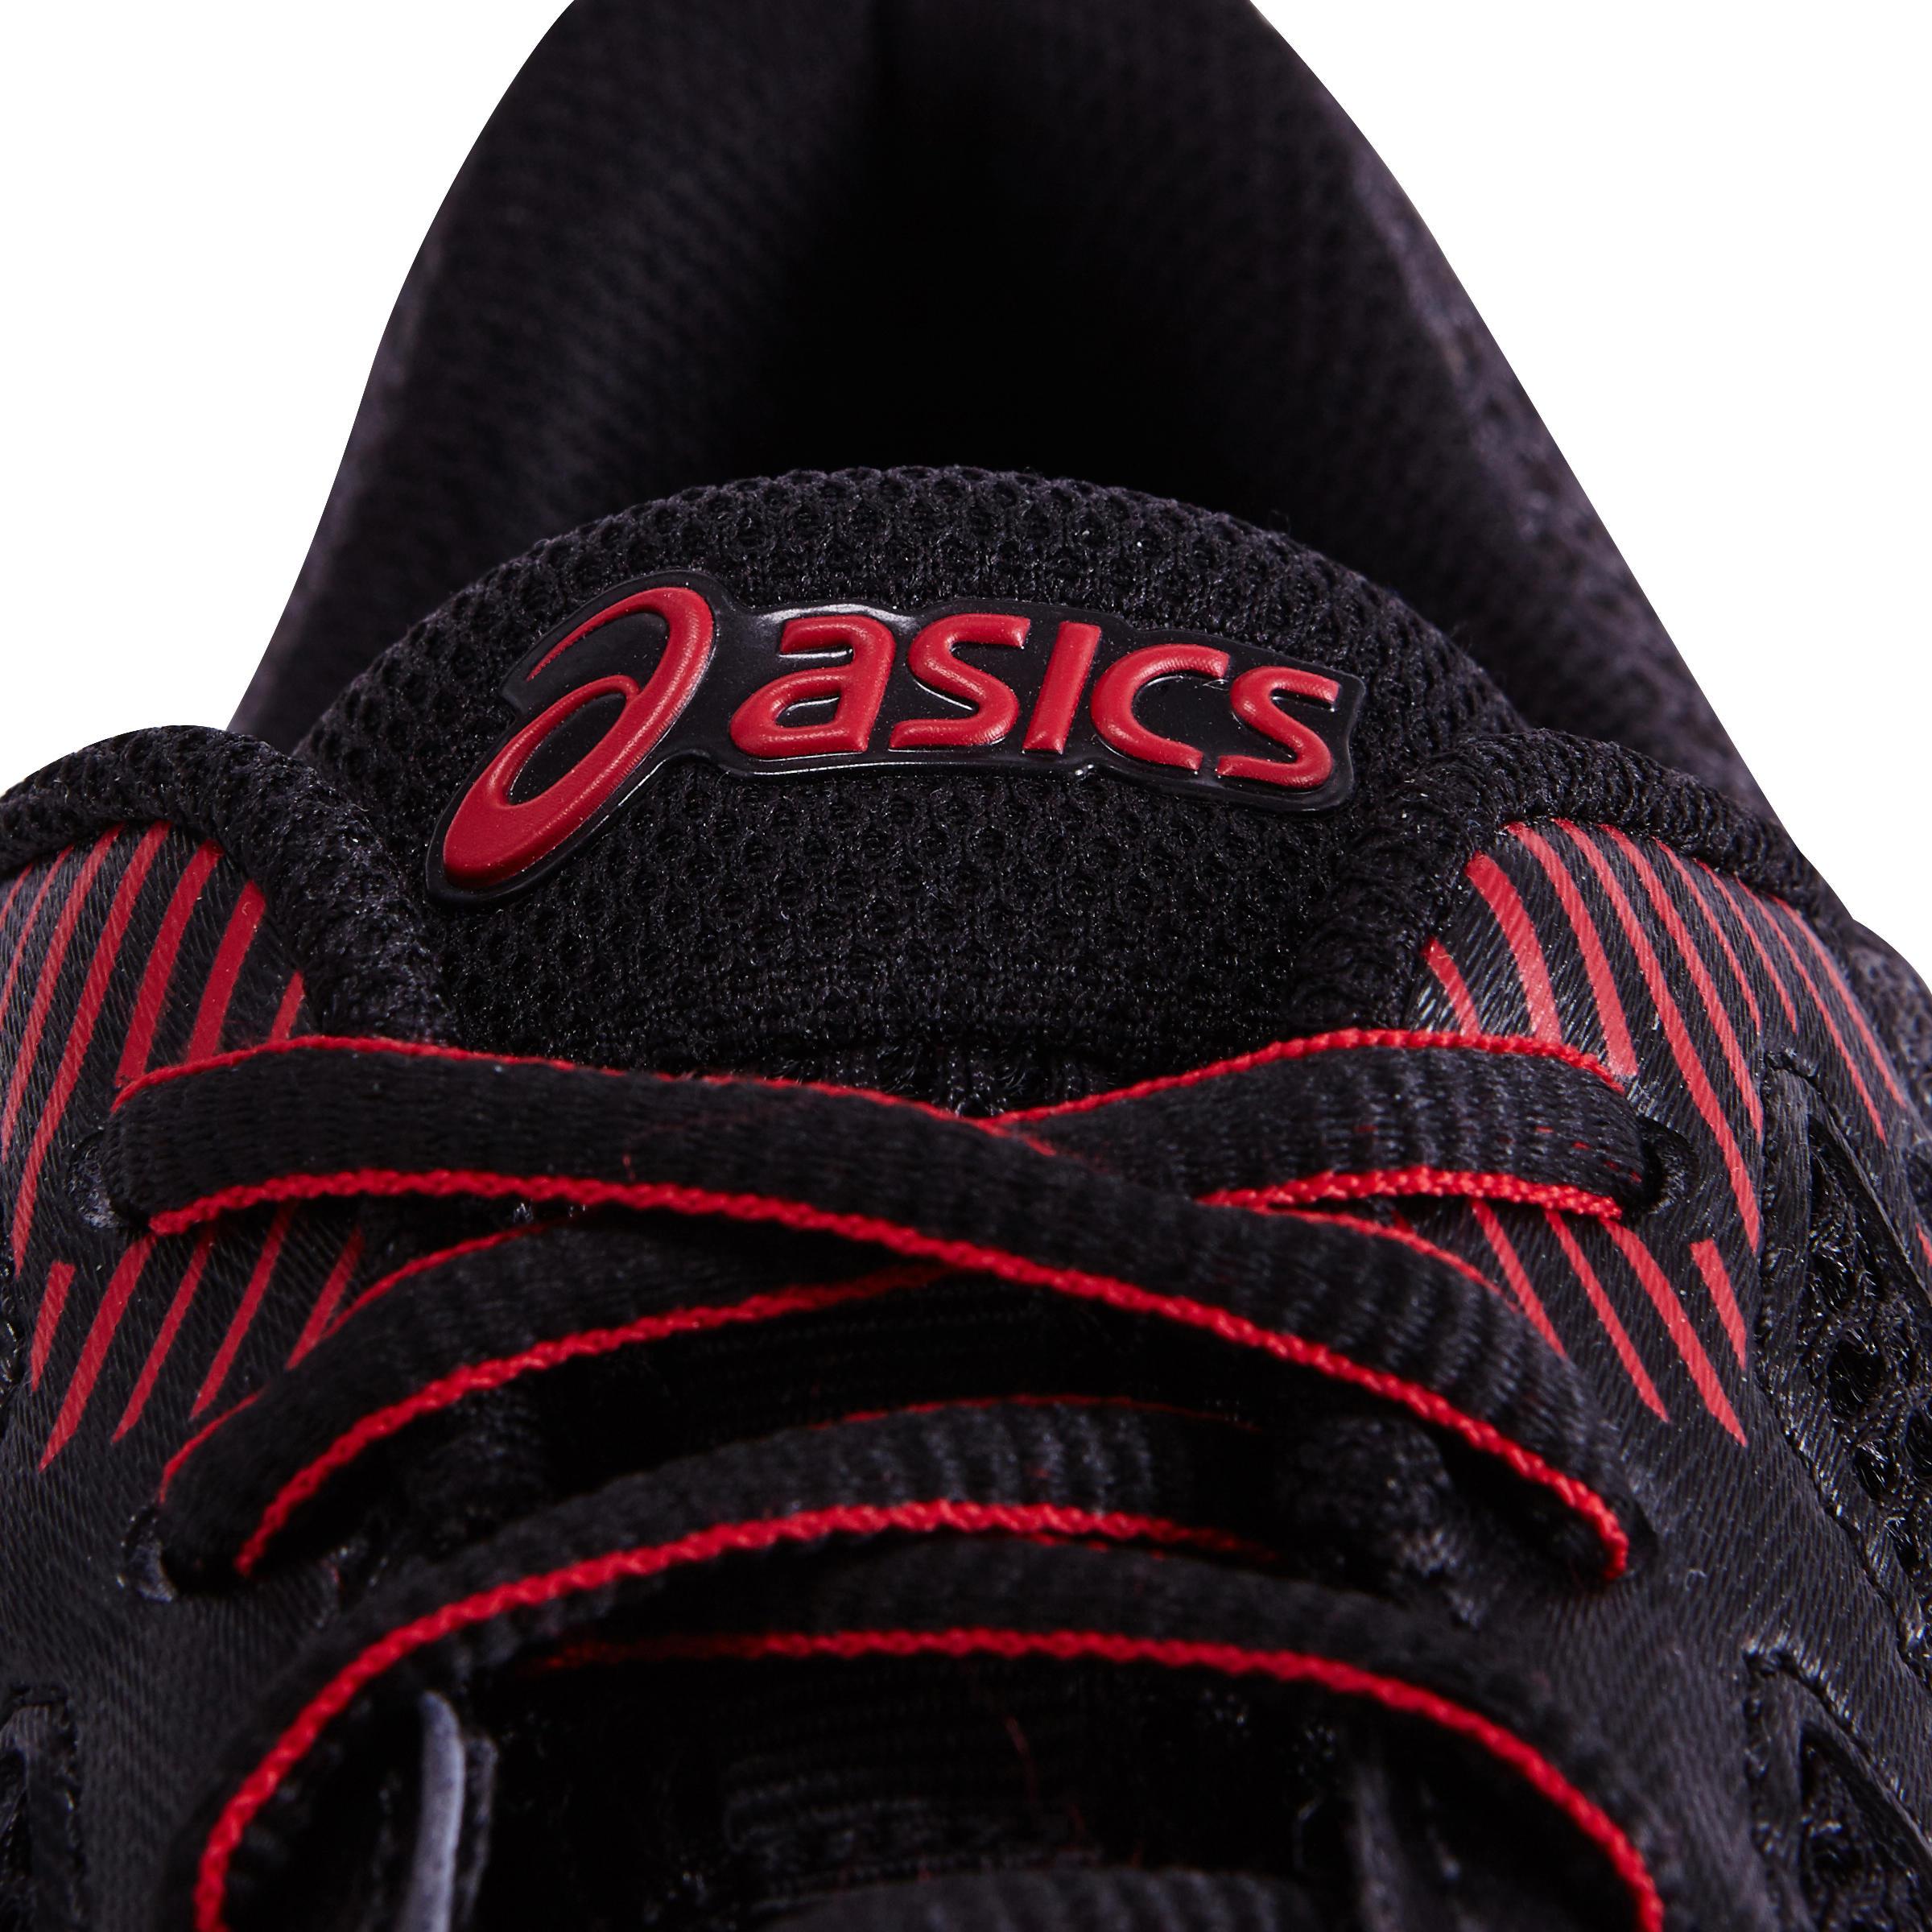 Gel Rouge Homme Windhawk Noir Chaussures Jogging TJF5ul1cK3